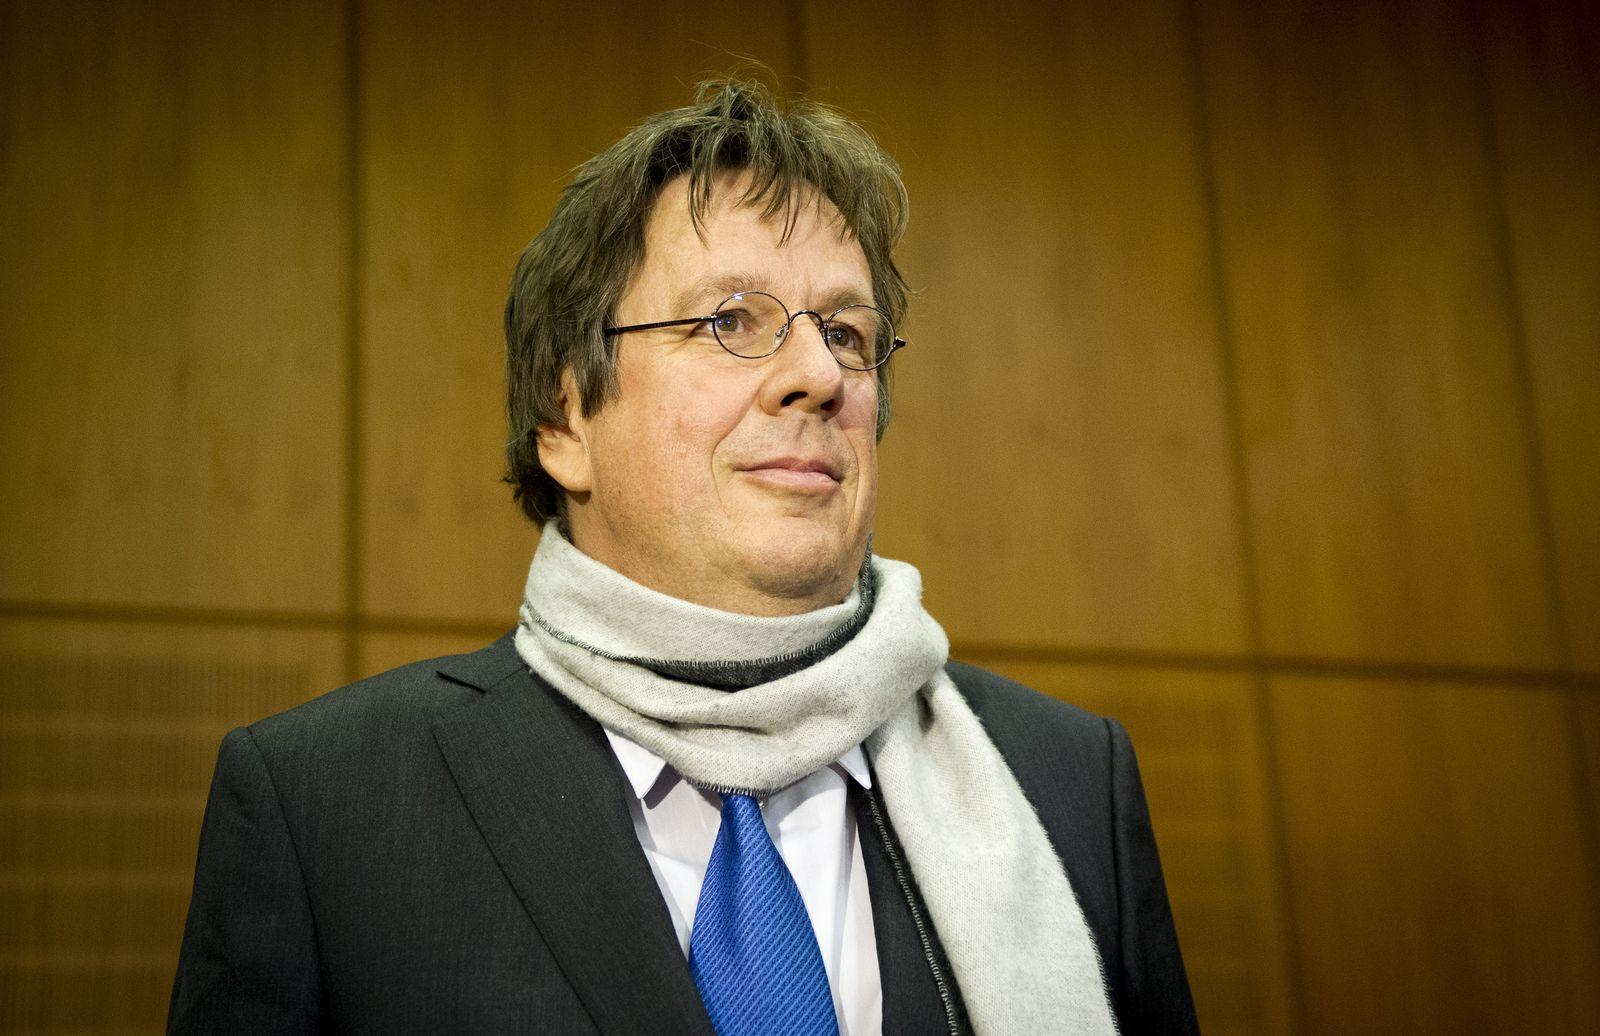 Buch/ Vergewaltigung/ Jörg Kachelmann Prozess